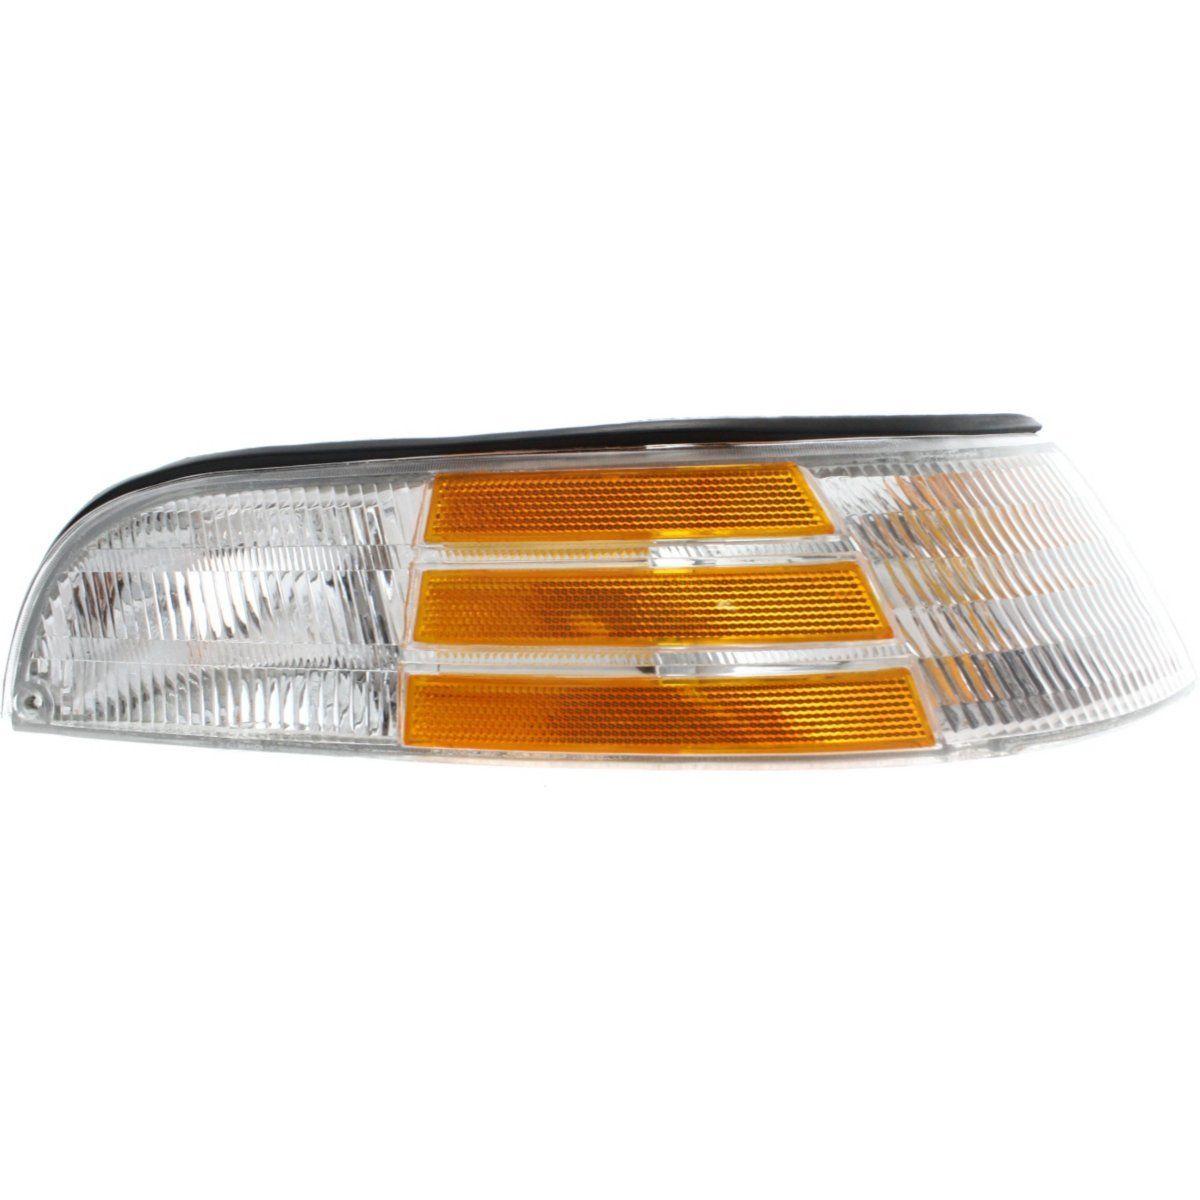 USコーナーライト Corner Light For 92-97 Ford Crown Victoria LX Passenger Side Incandescent コーナーライトライト92-97フォードクラウンビクトリアLX乗用車側白熱灯